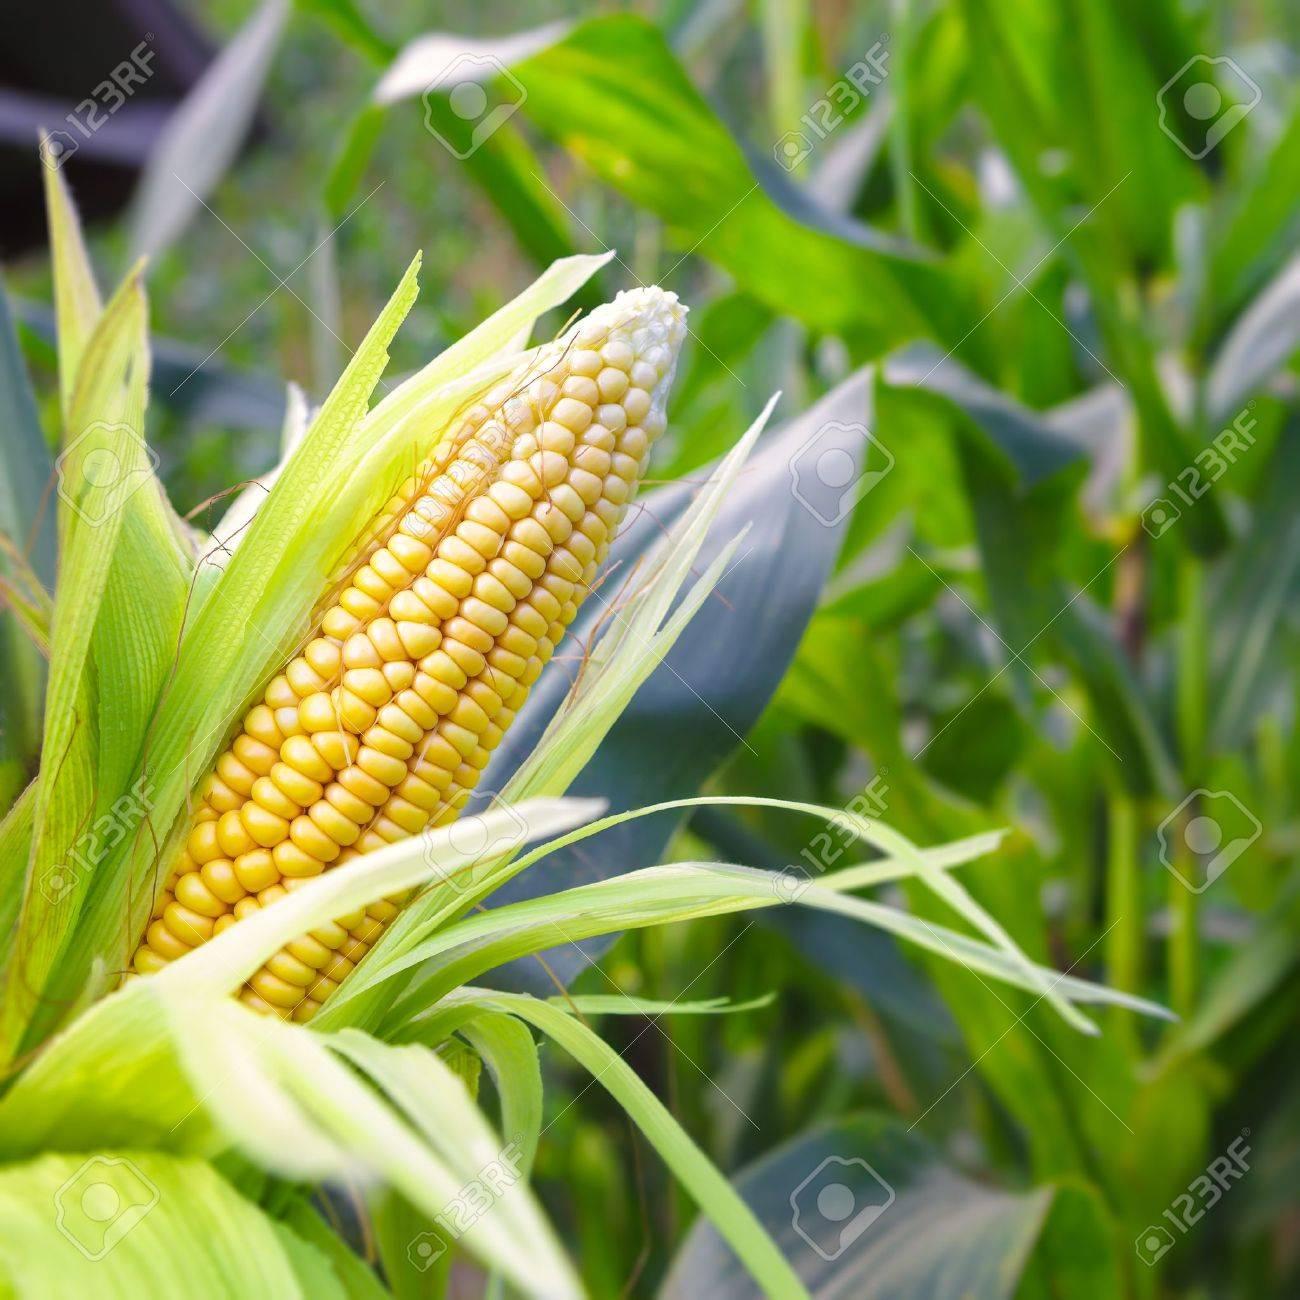 Closeup corn on the stalk in the corn field - 21783736